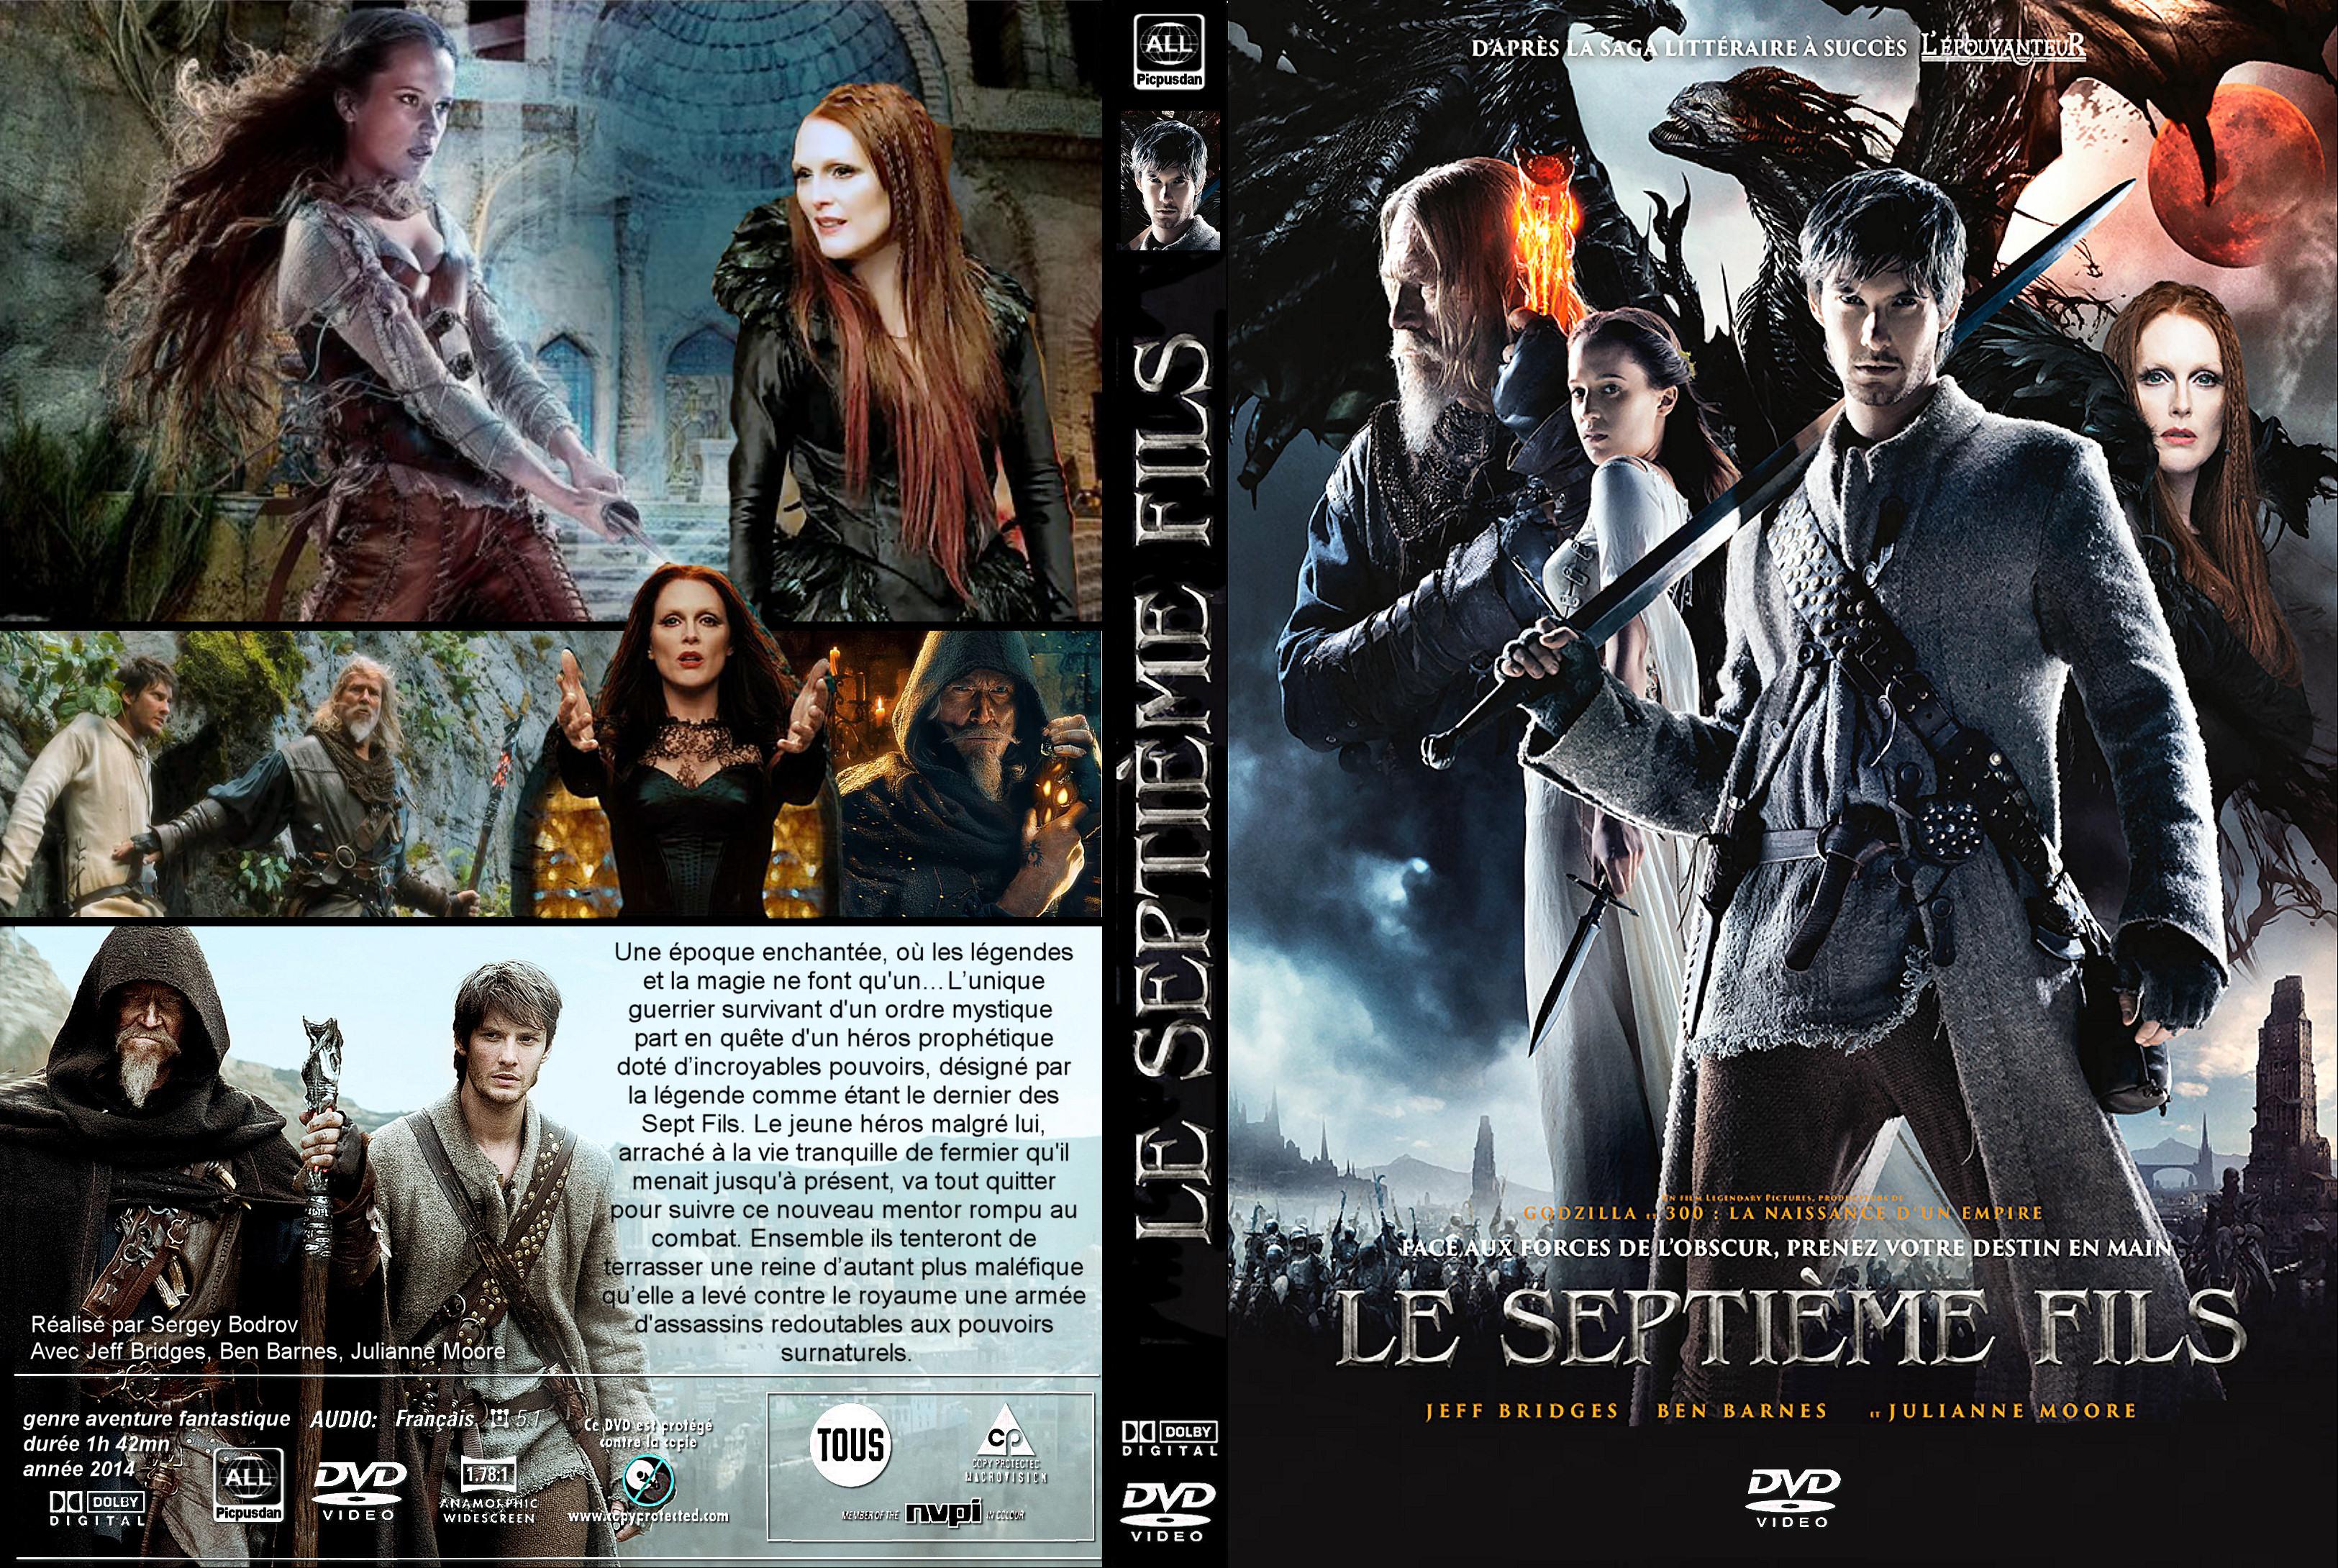 le septieme fils dvd